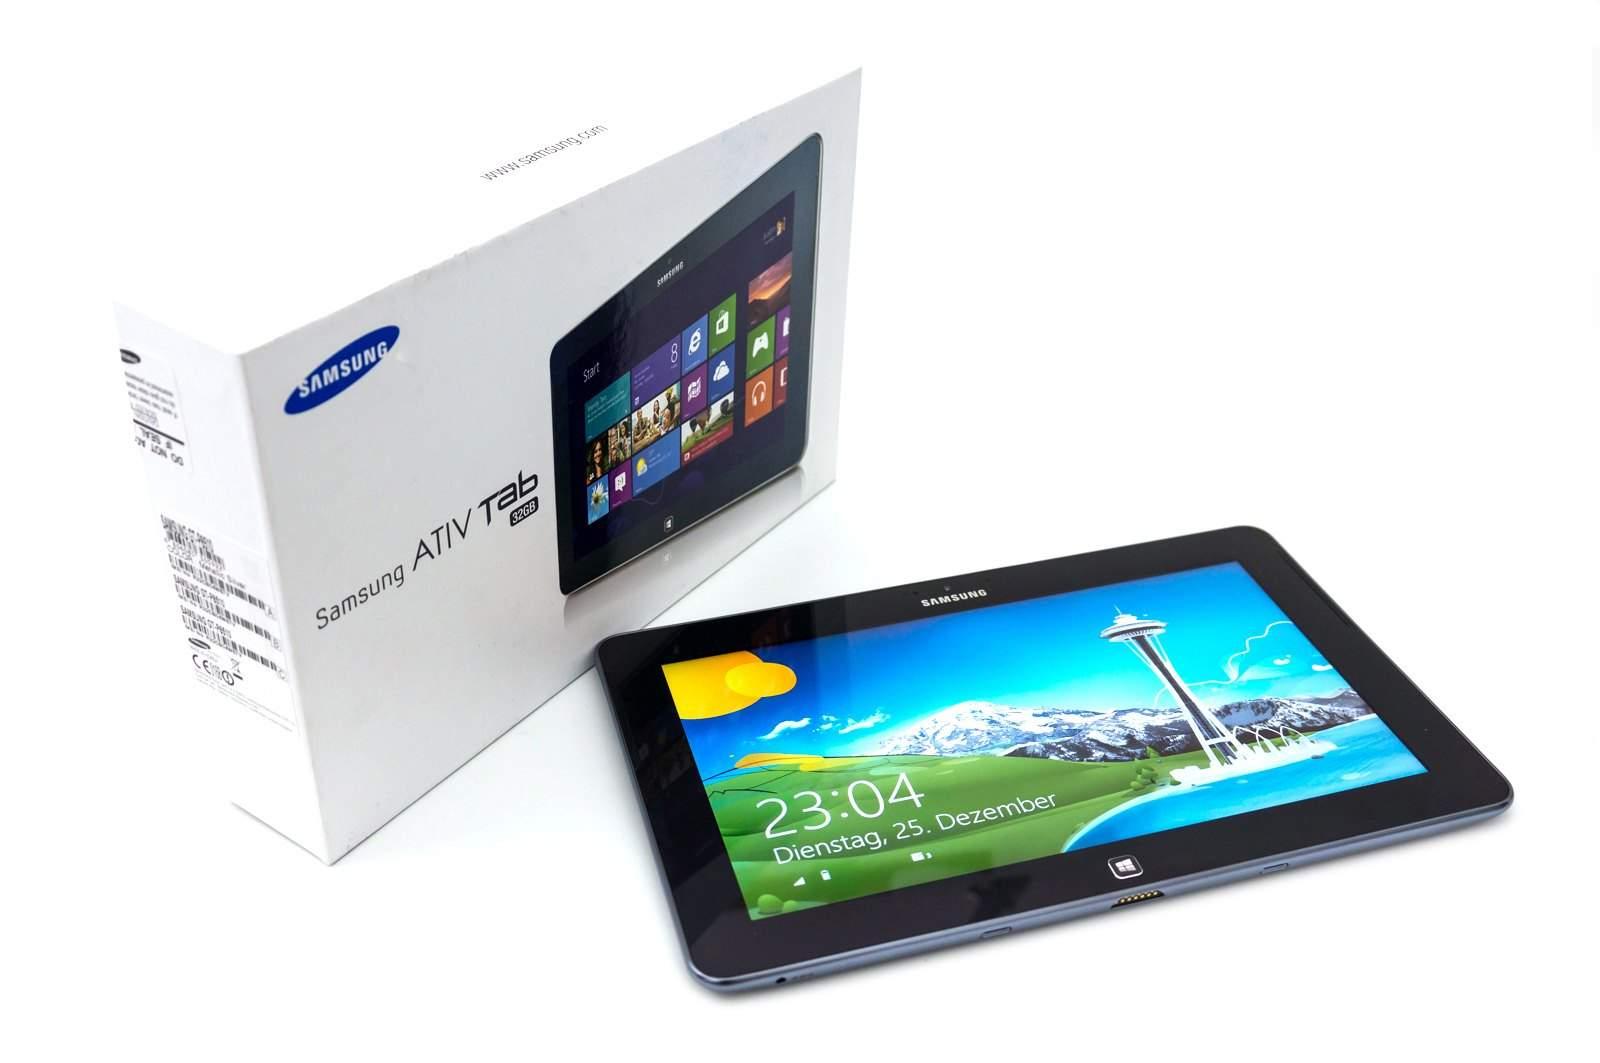 Samsung ATIV Windows 8 tablet iz 2013. god.